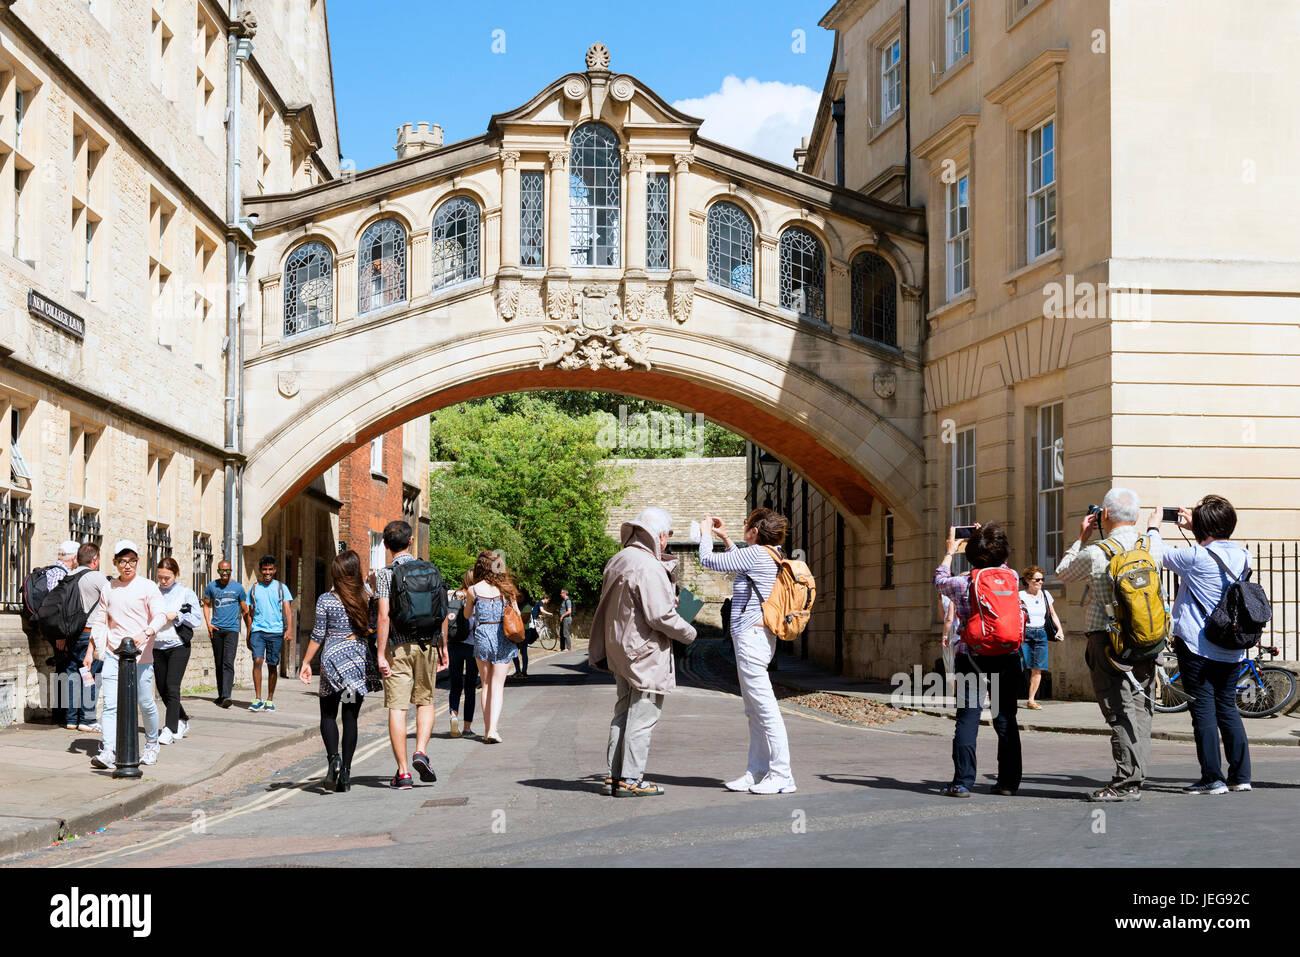 Seufzerbrücke, Oxford City Centre, Großbritannien. Stockbild